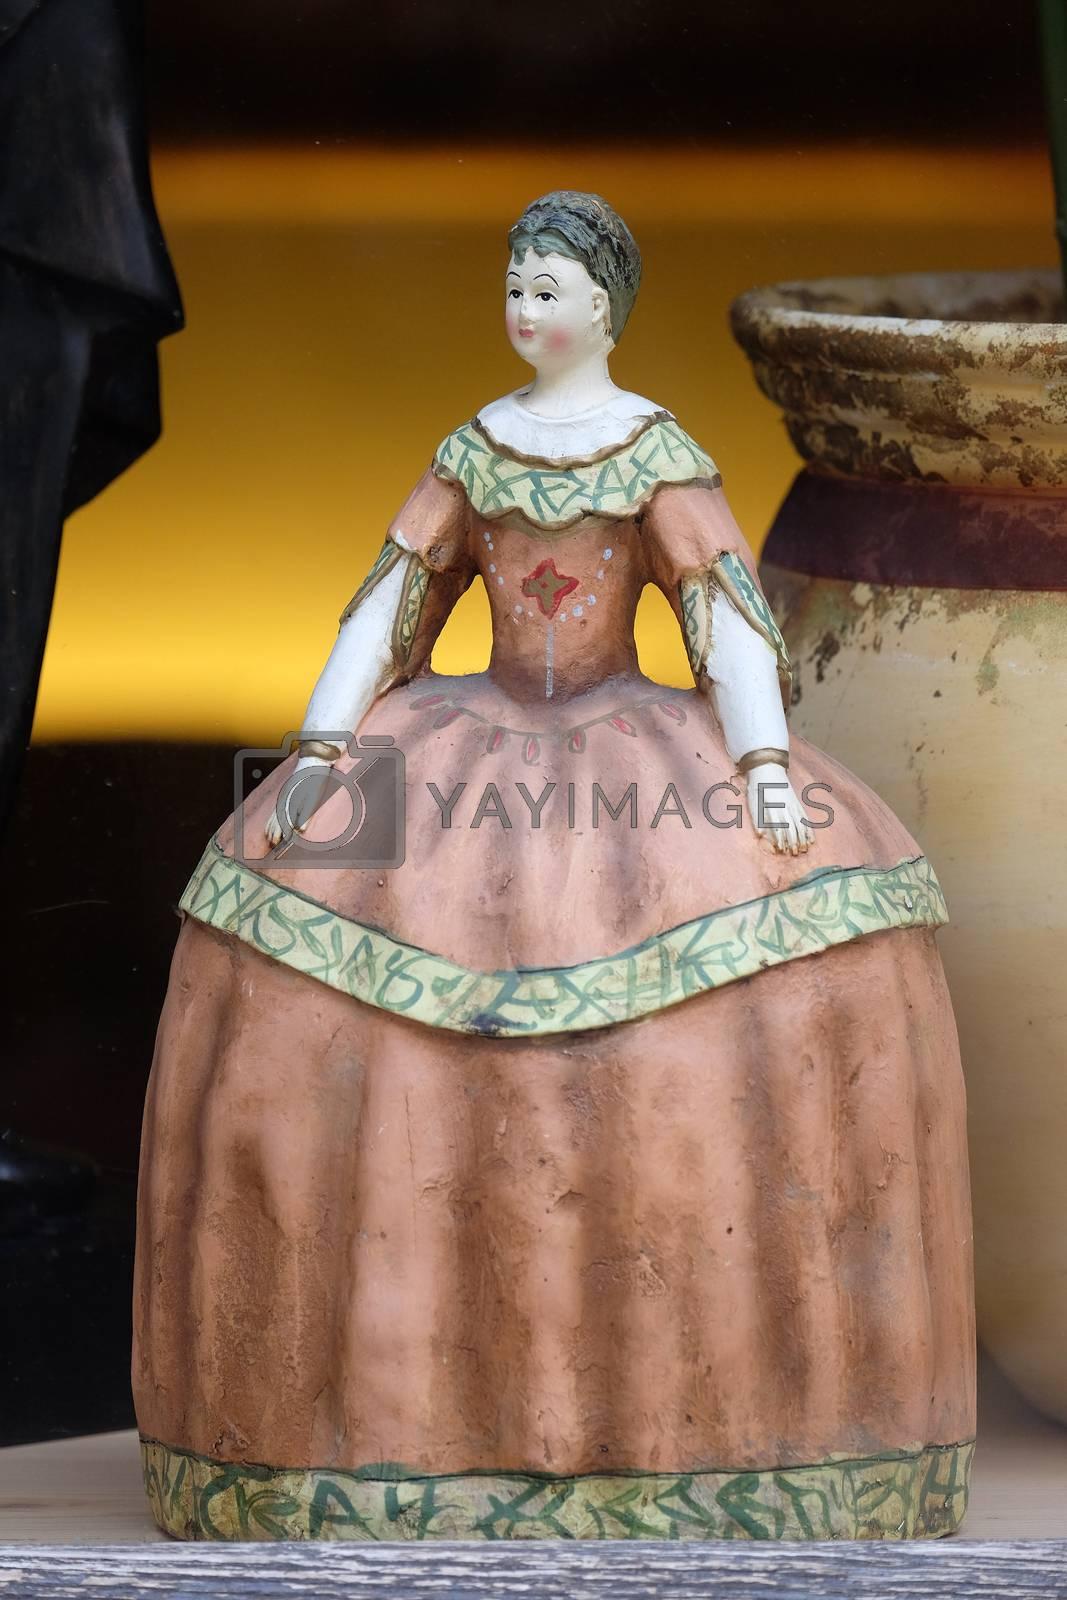 Old vintage doll in antique shop, Graz, Styria, Austria